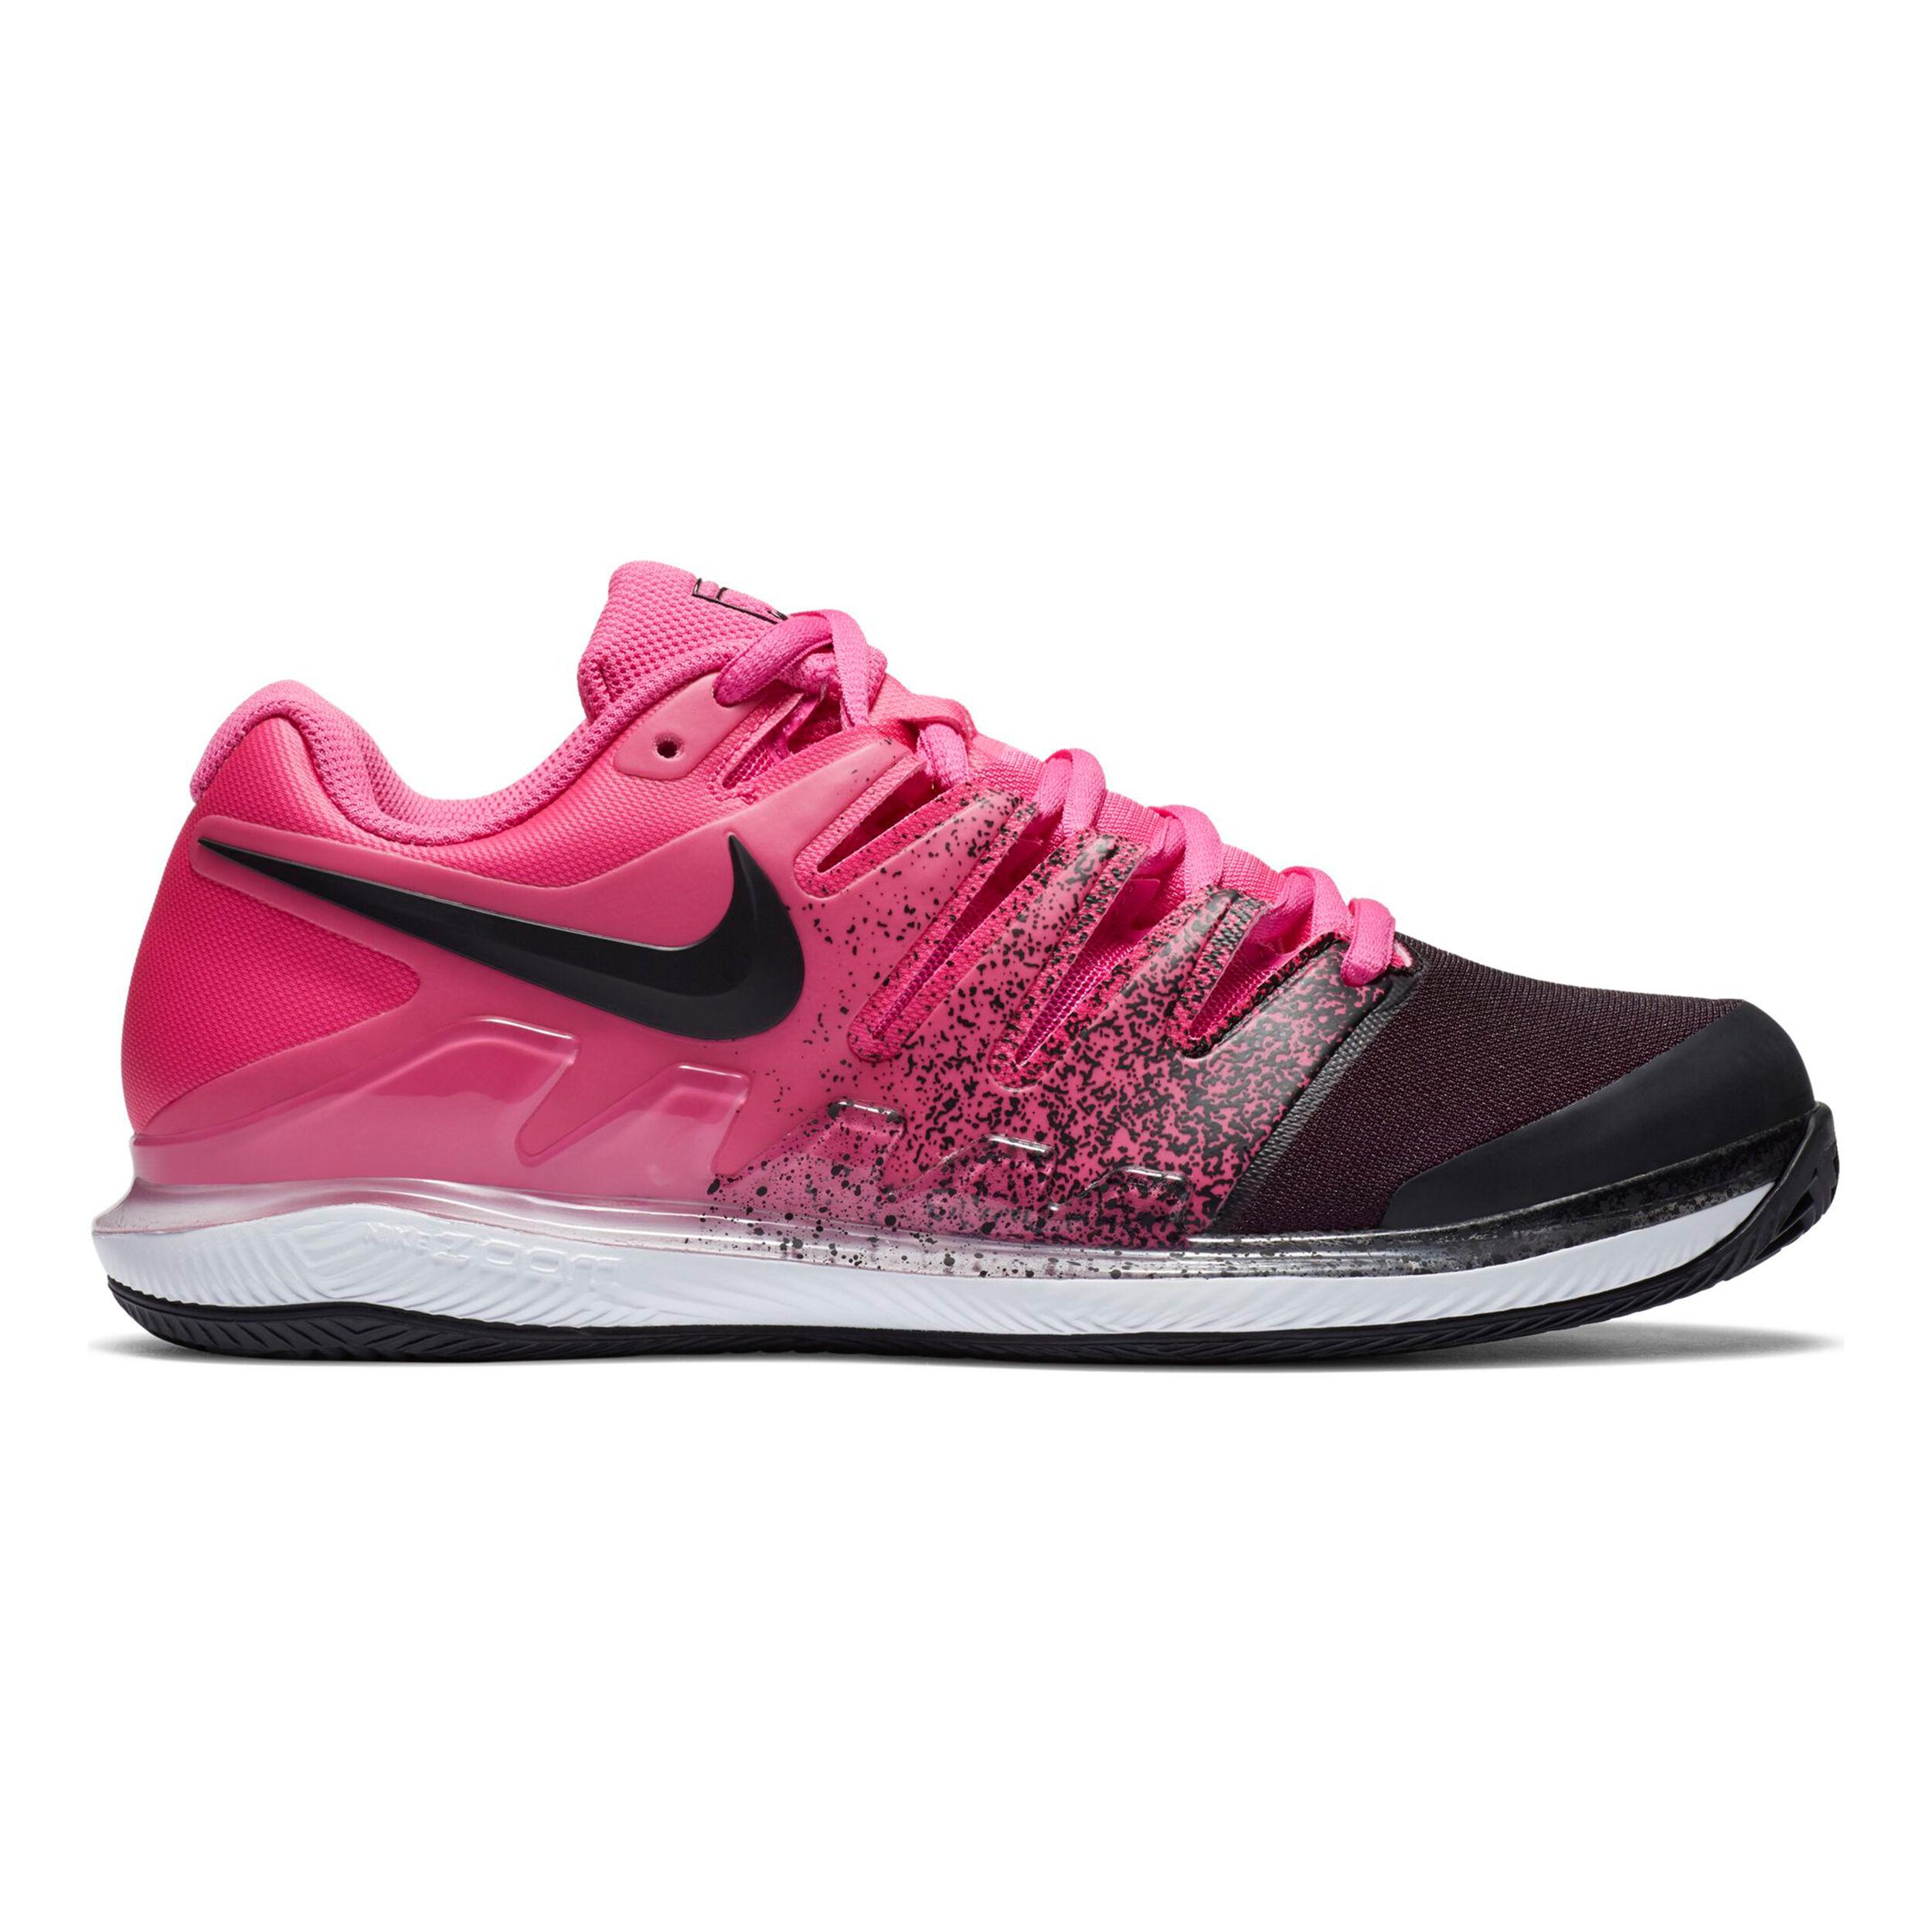 buy Nike Air Zoom Vapor X Clay Court Shoe Women - Pink, Black ...